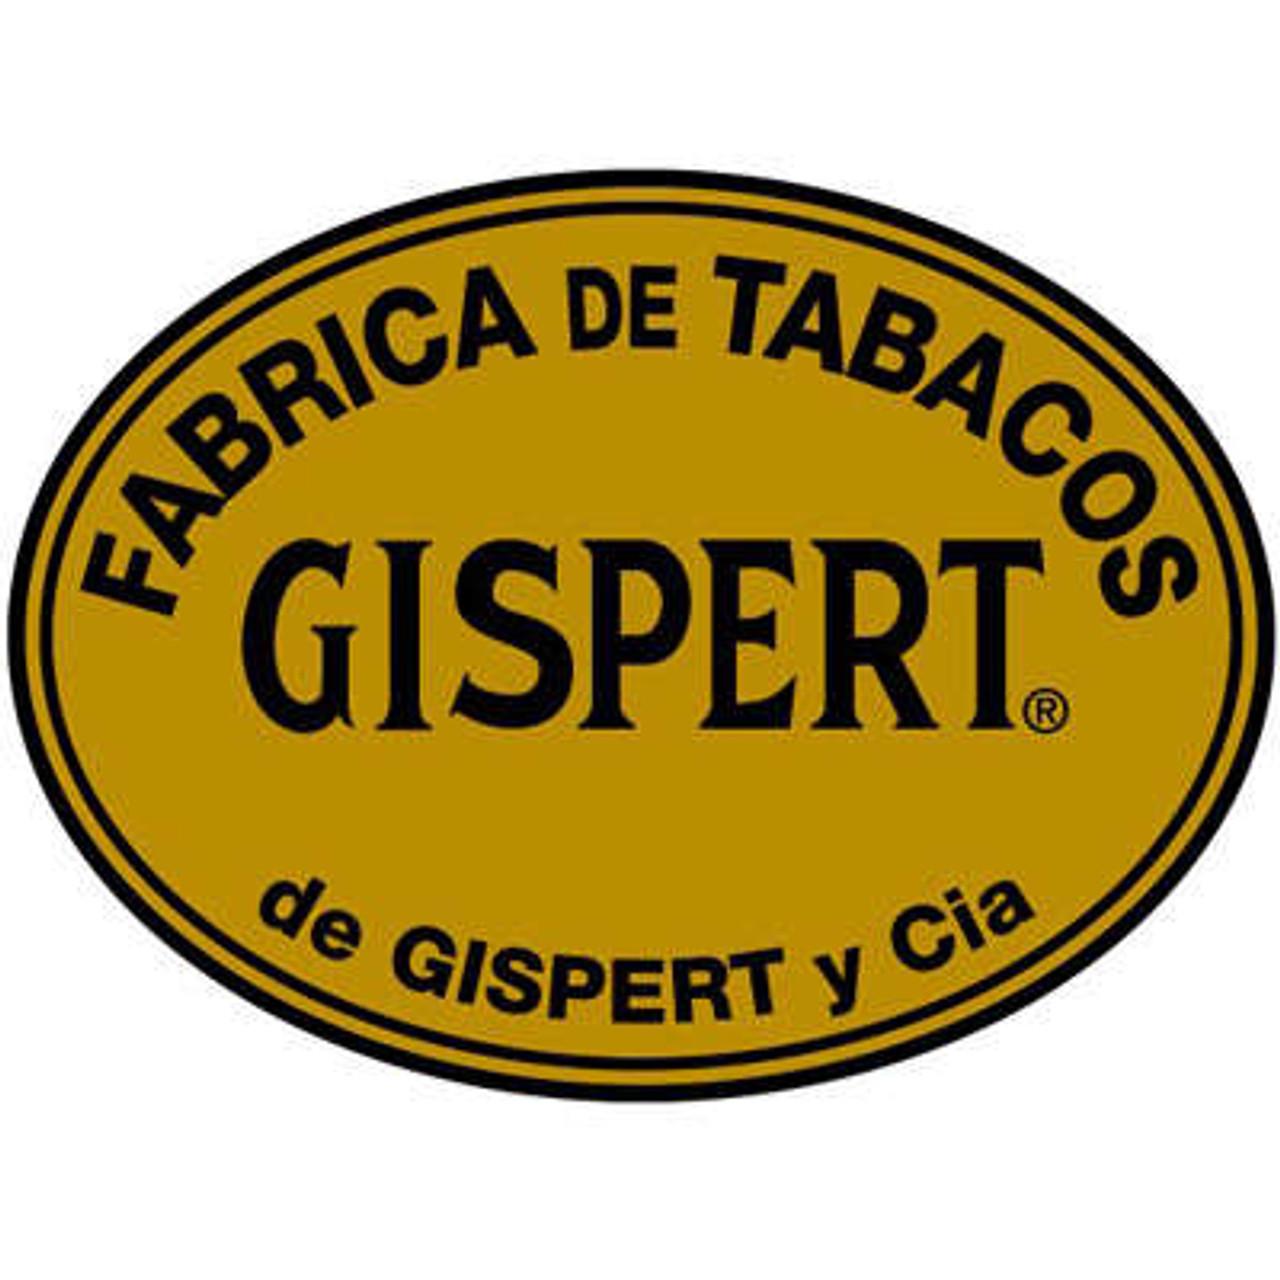 Gispert Robusto Natural Cigars - 5 x 54 (Box of 25)